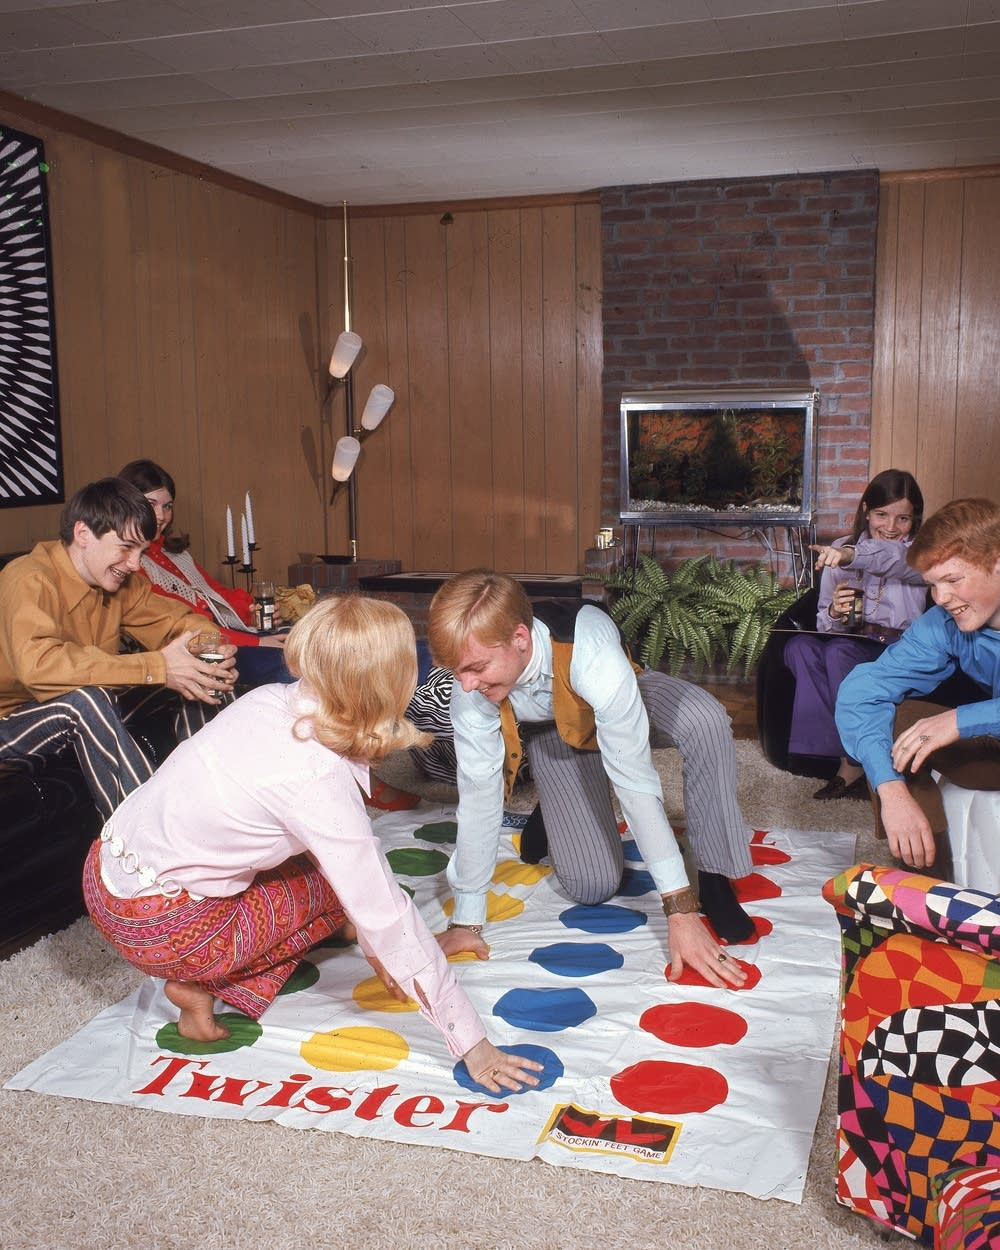 5 iconic toys born in Minnesota | MPR News